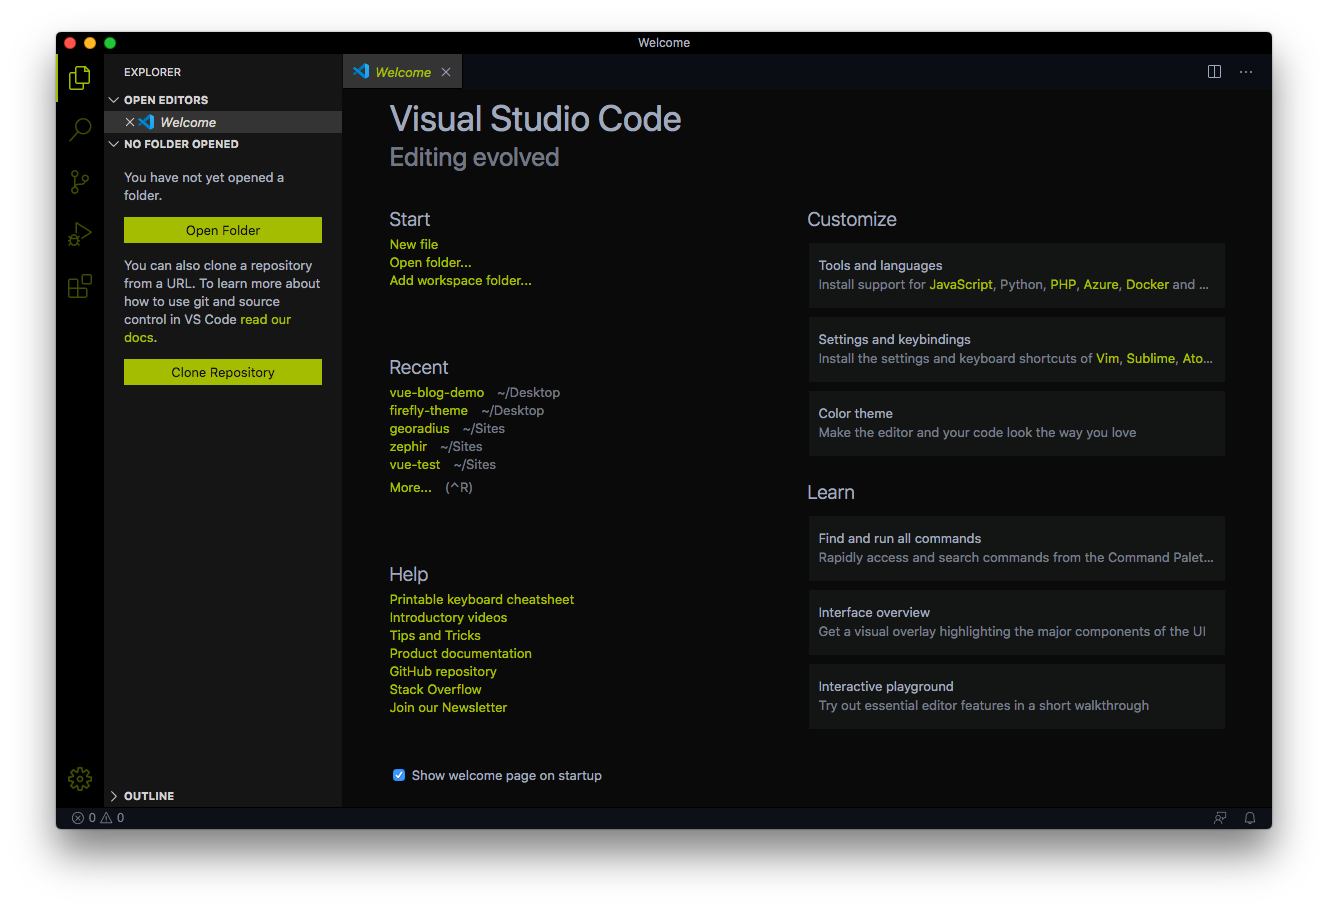 FireFly Pro VS Code theme